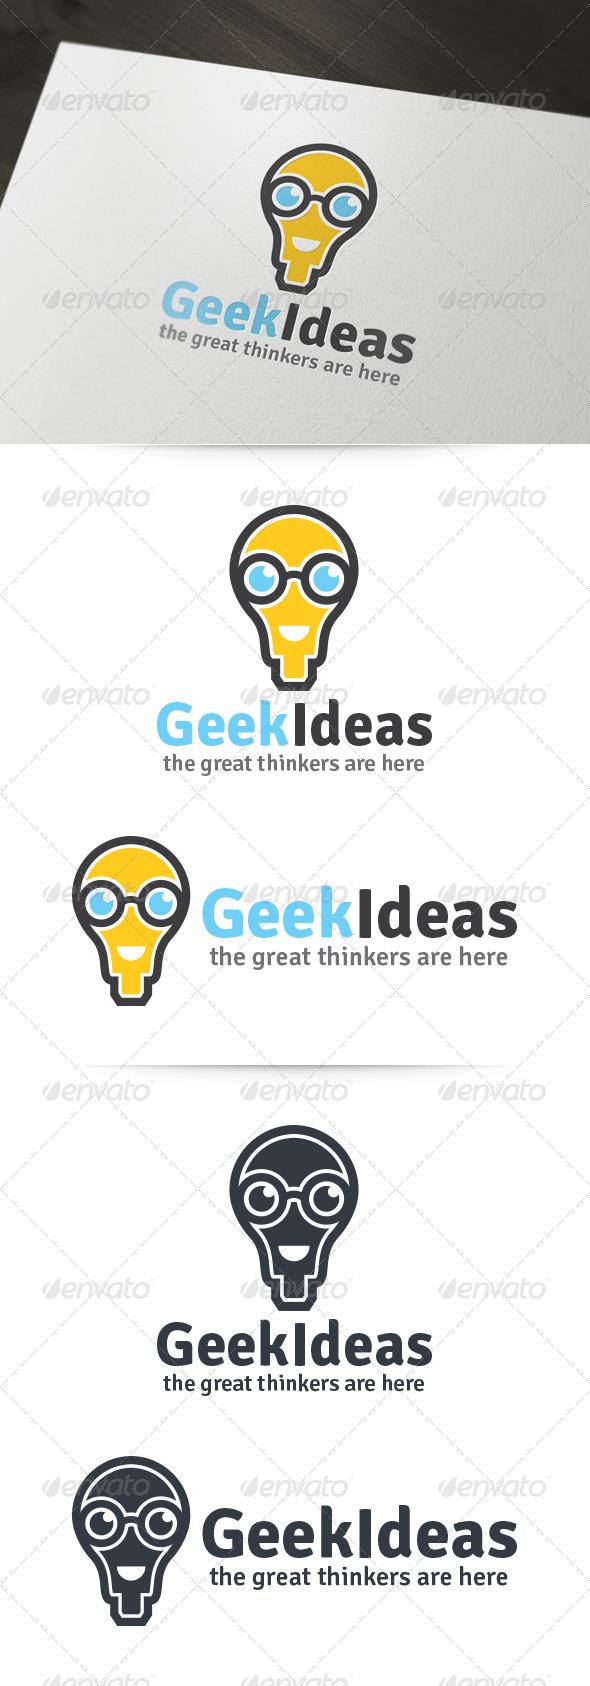 GraphicRiver Geek Ideas Logo 6119518